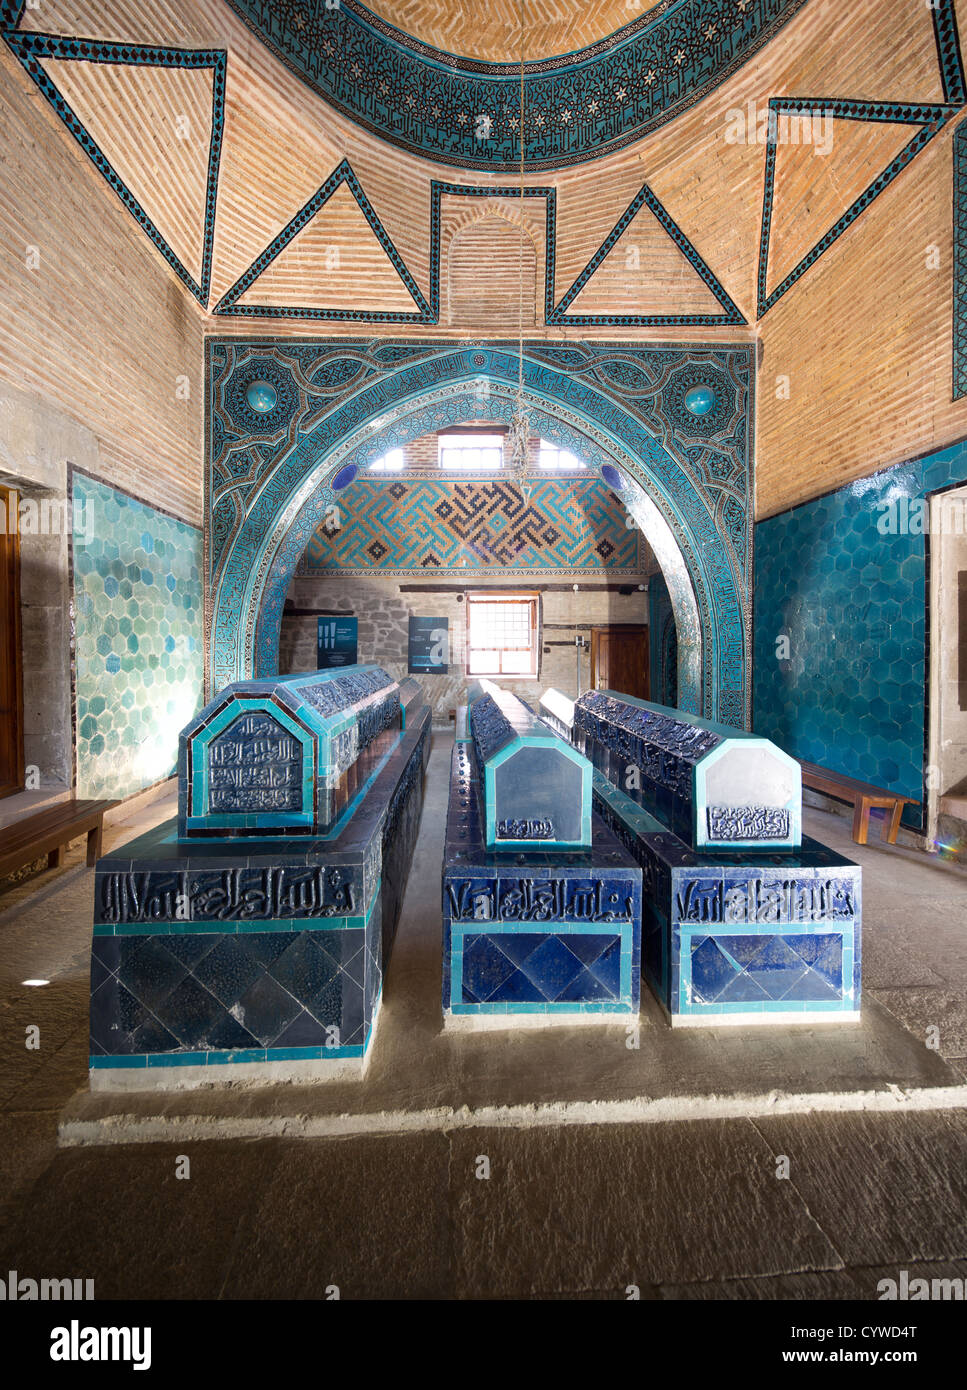 mausoleum, Sahib Ata complex, Konya, Turkey - Stock Image